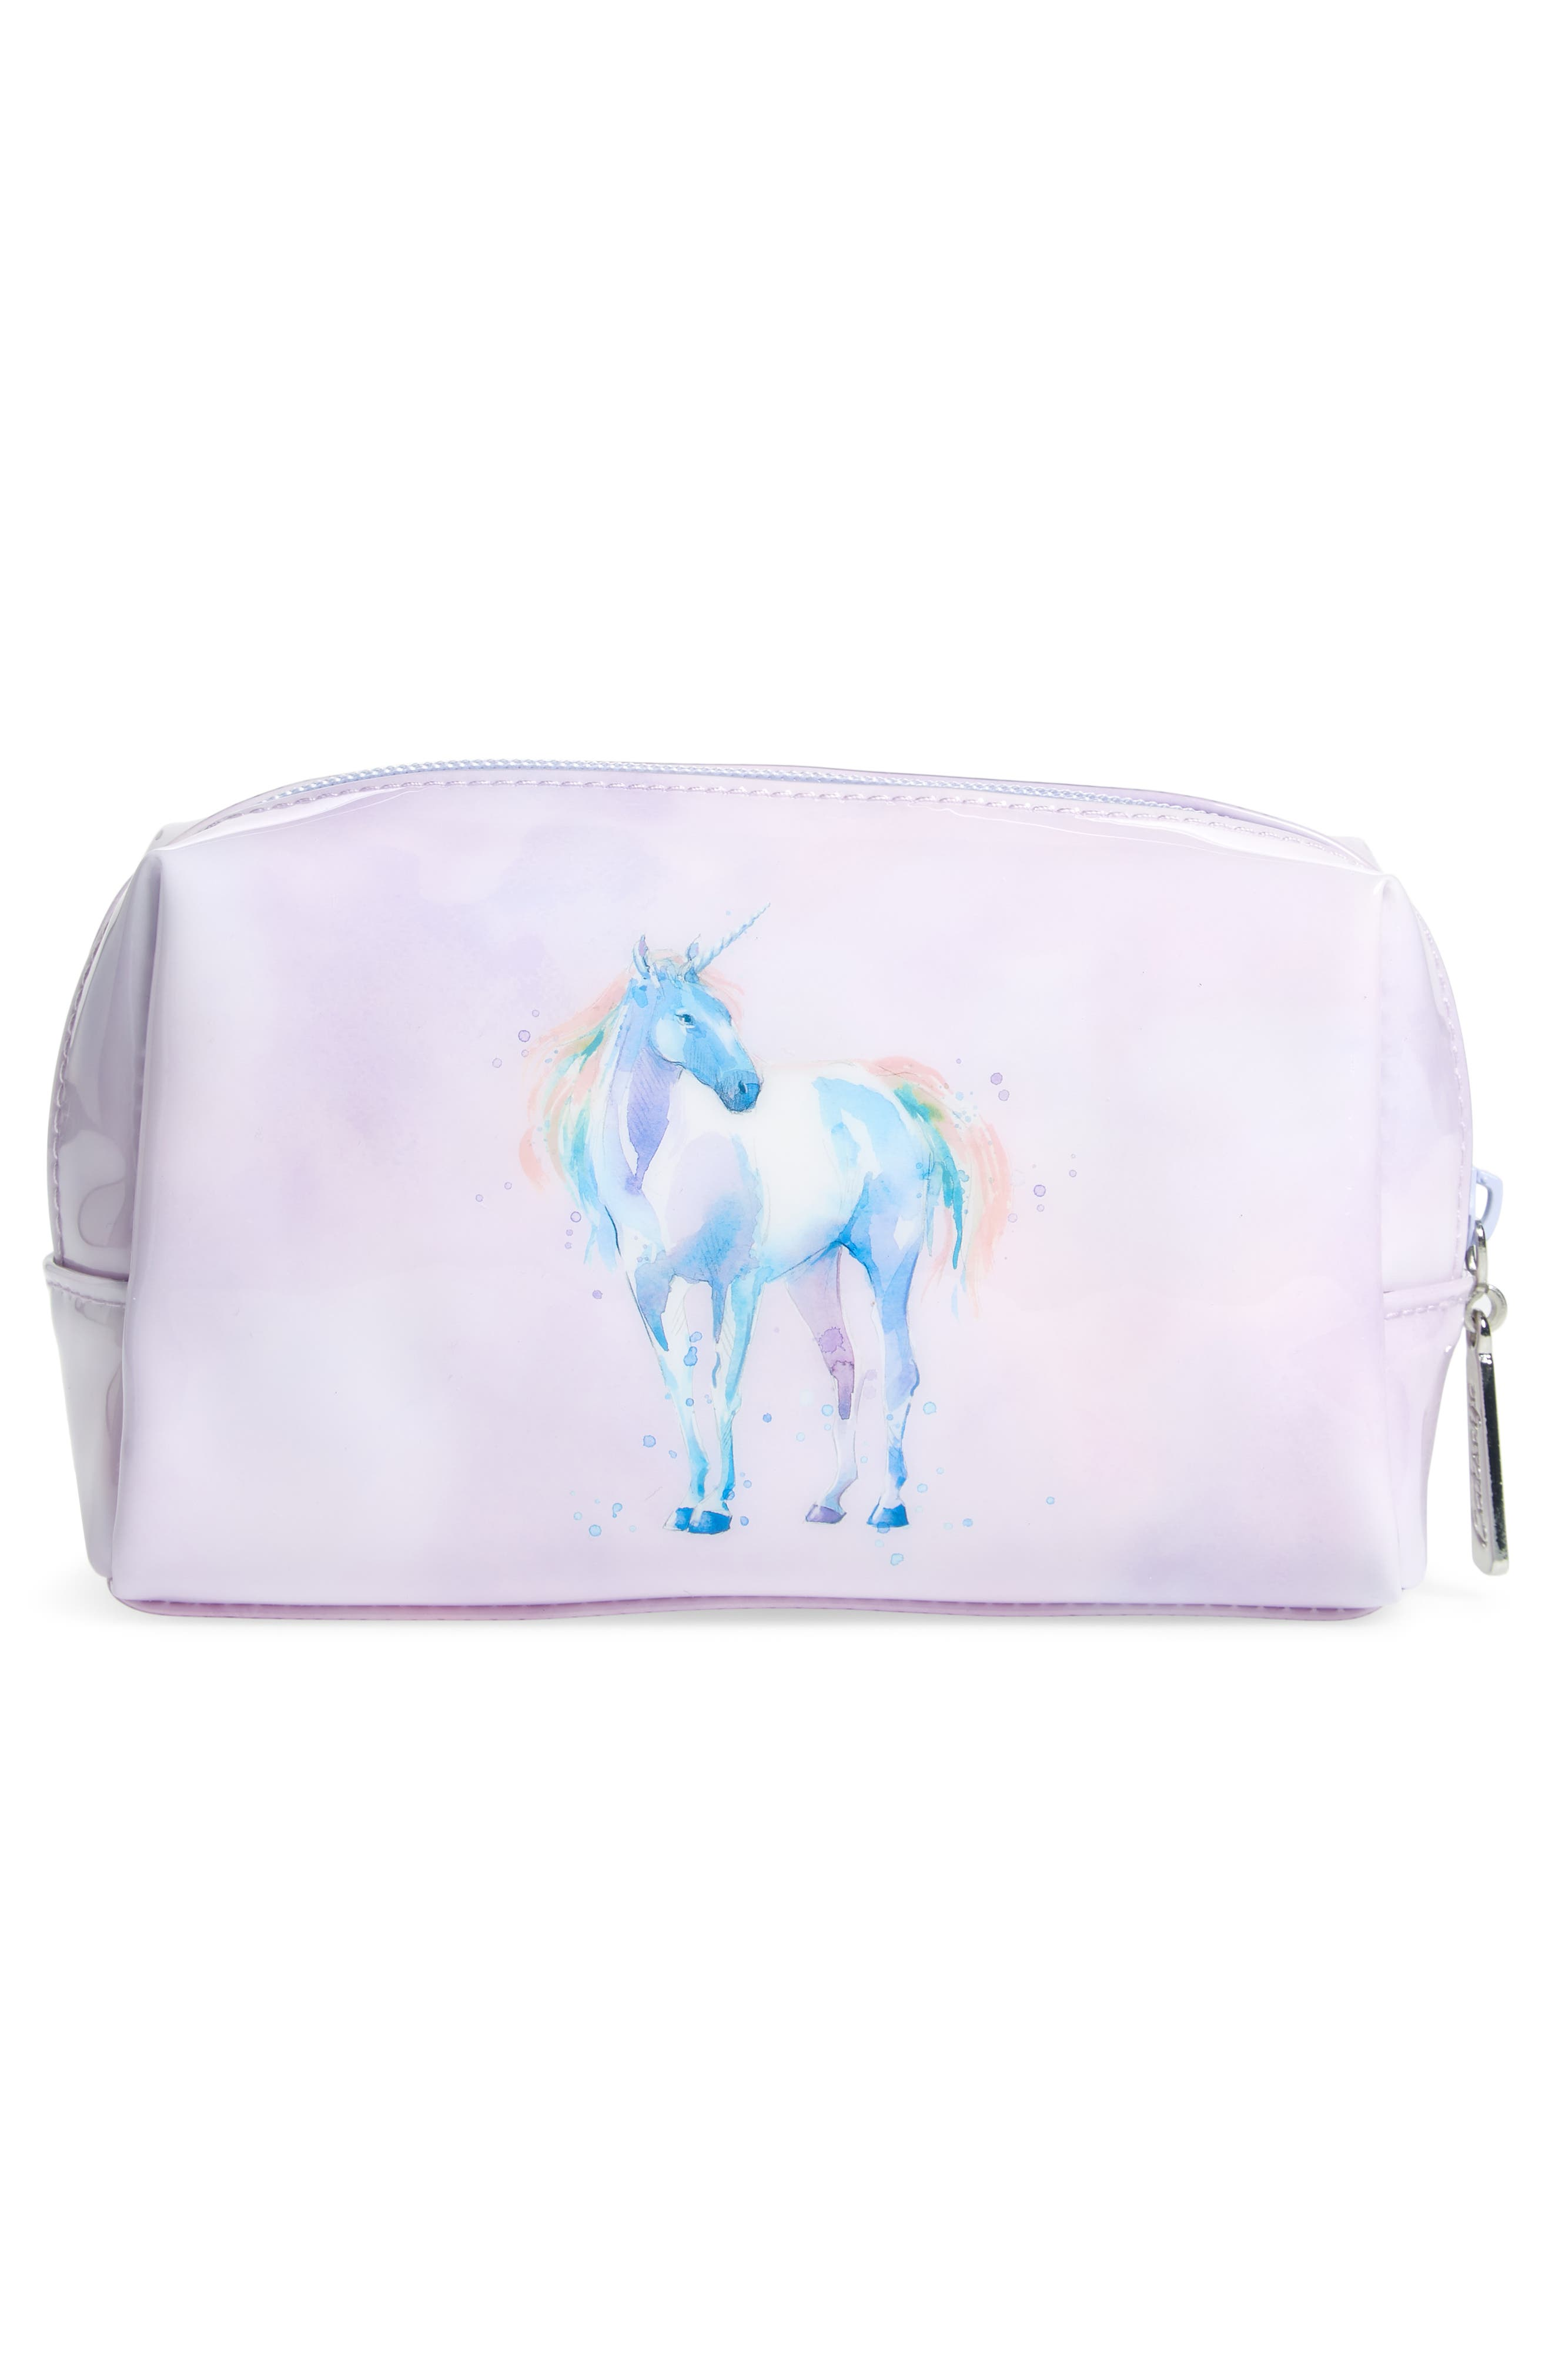 Watercolor Unicorn Cosmetics Case,                             Alternate thumbnail 2, color,                             530